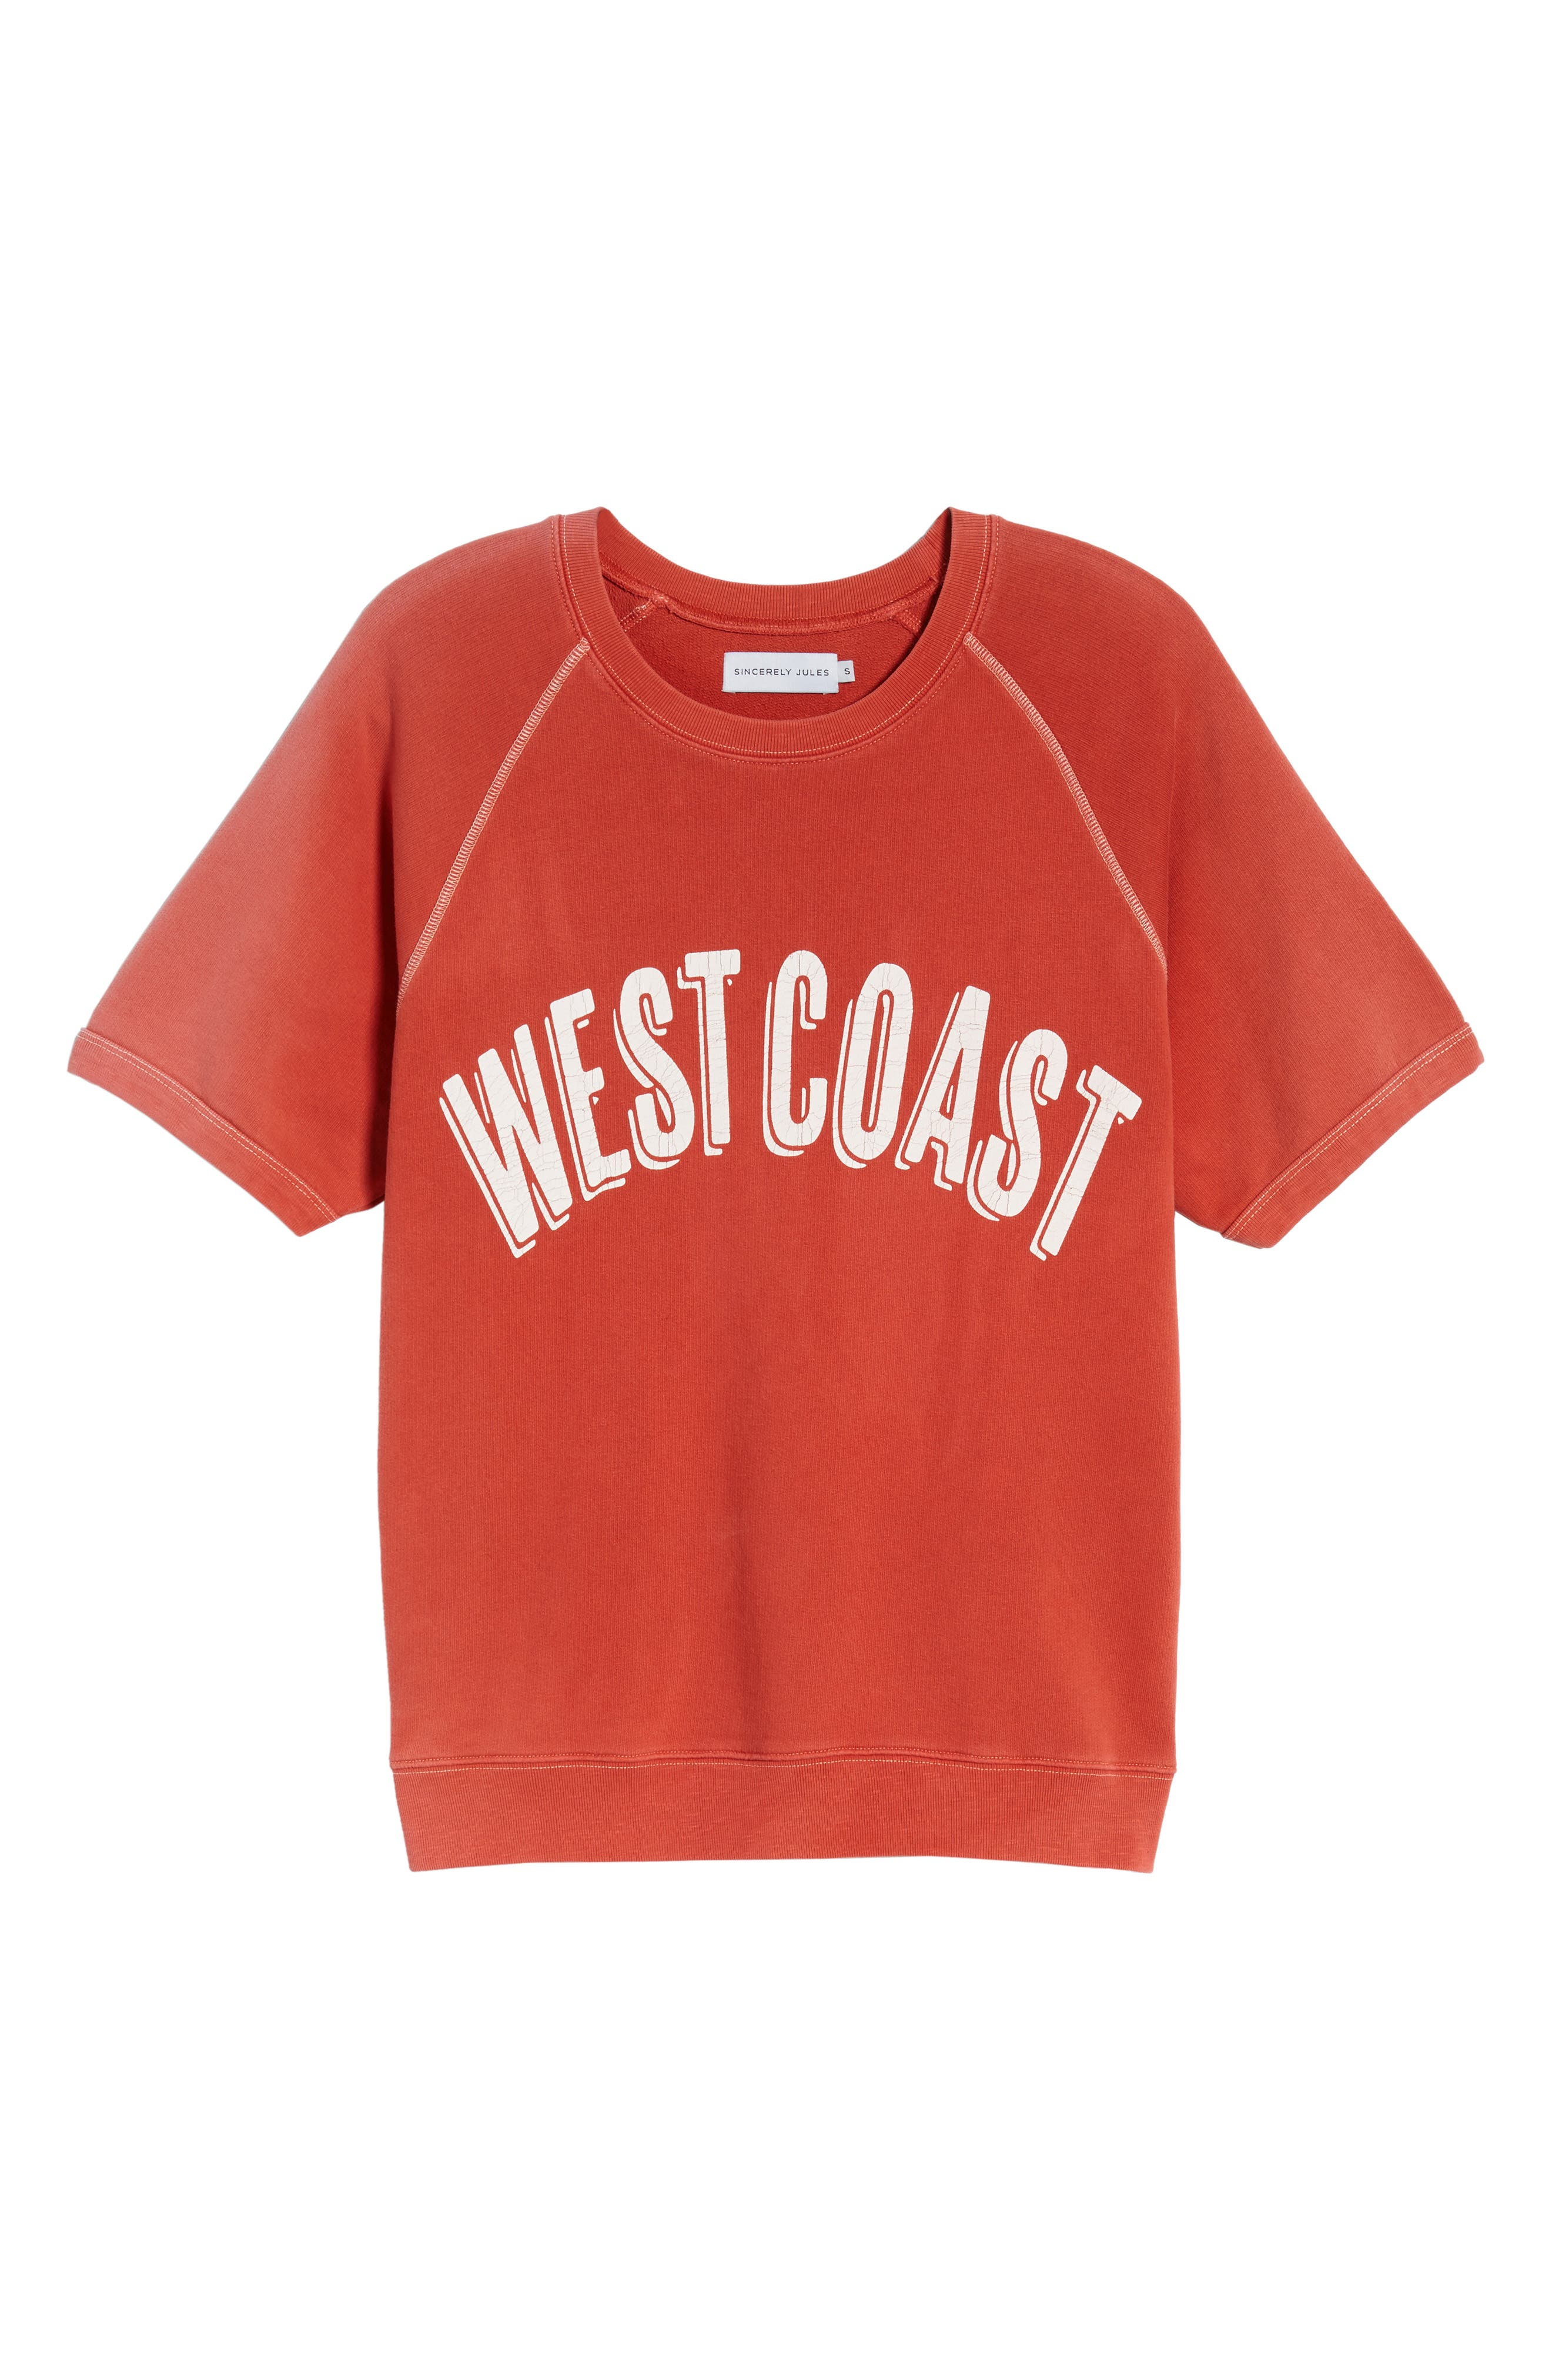 West Coast Sweatshirt,                             Alternate thumbnail 6, color,                             600